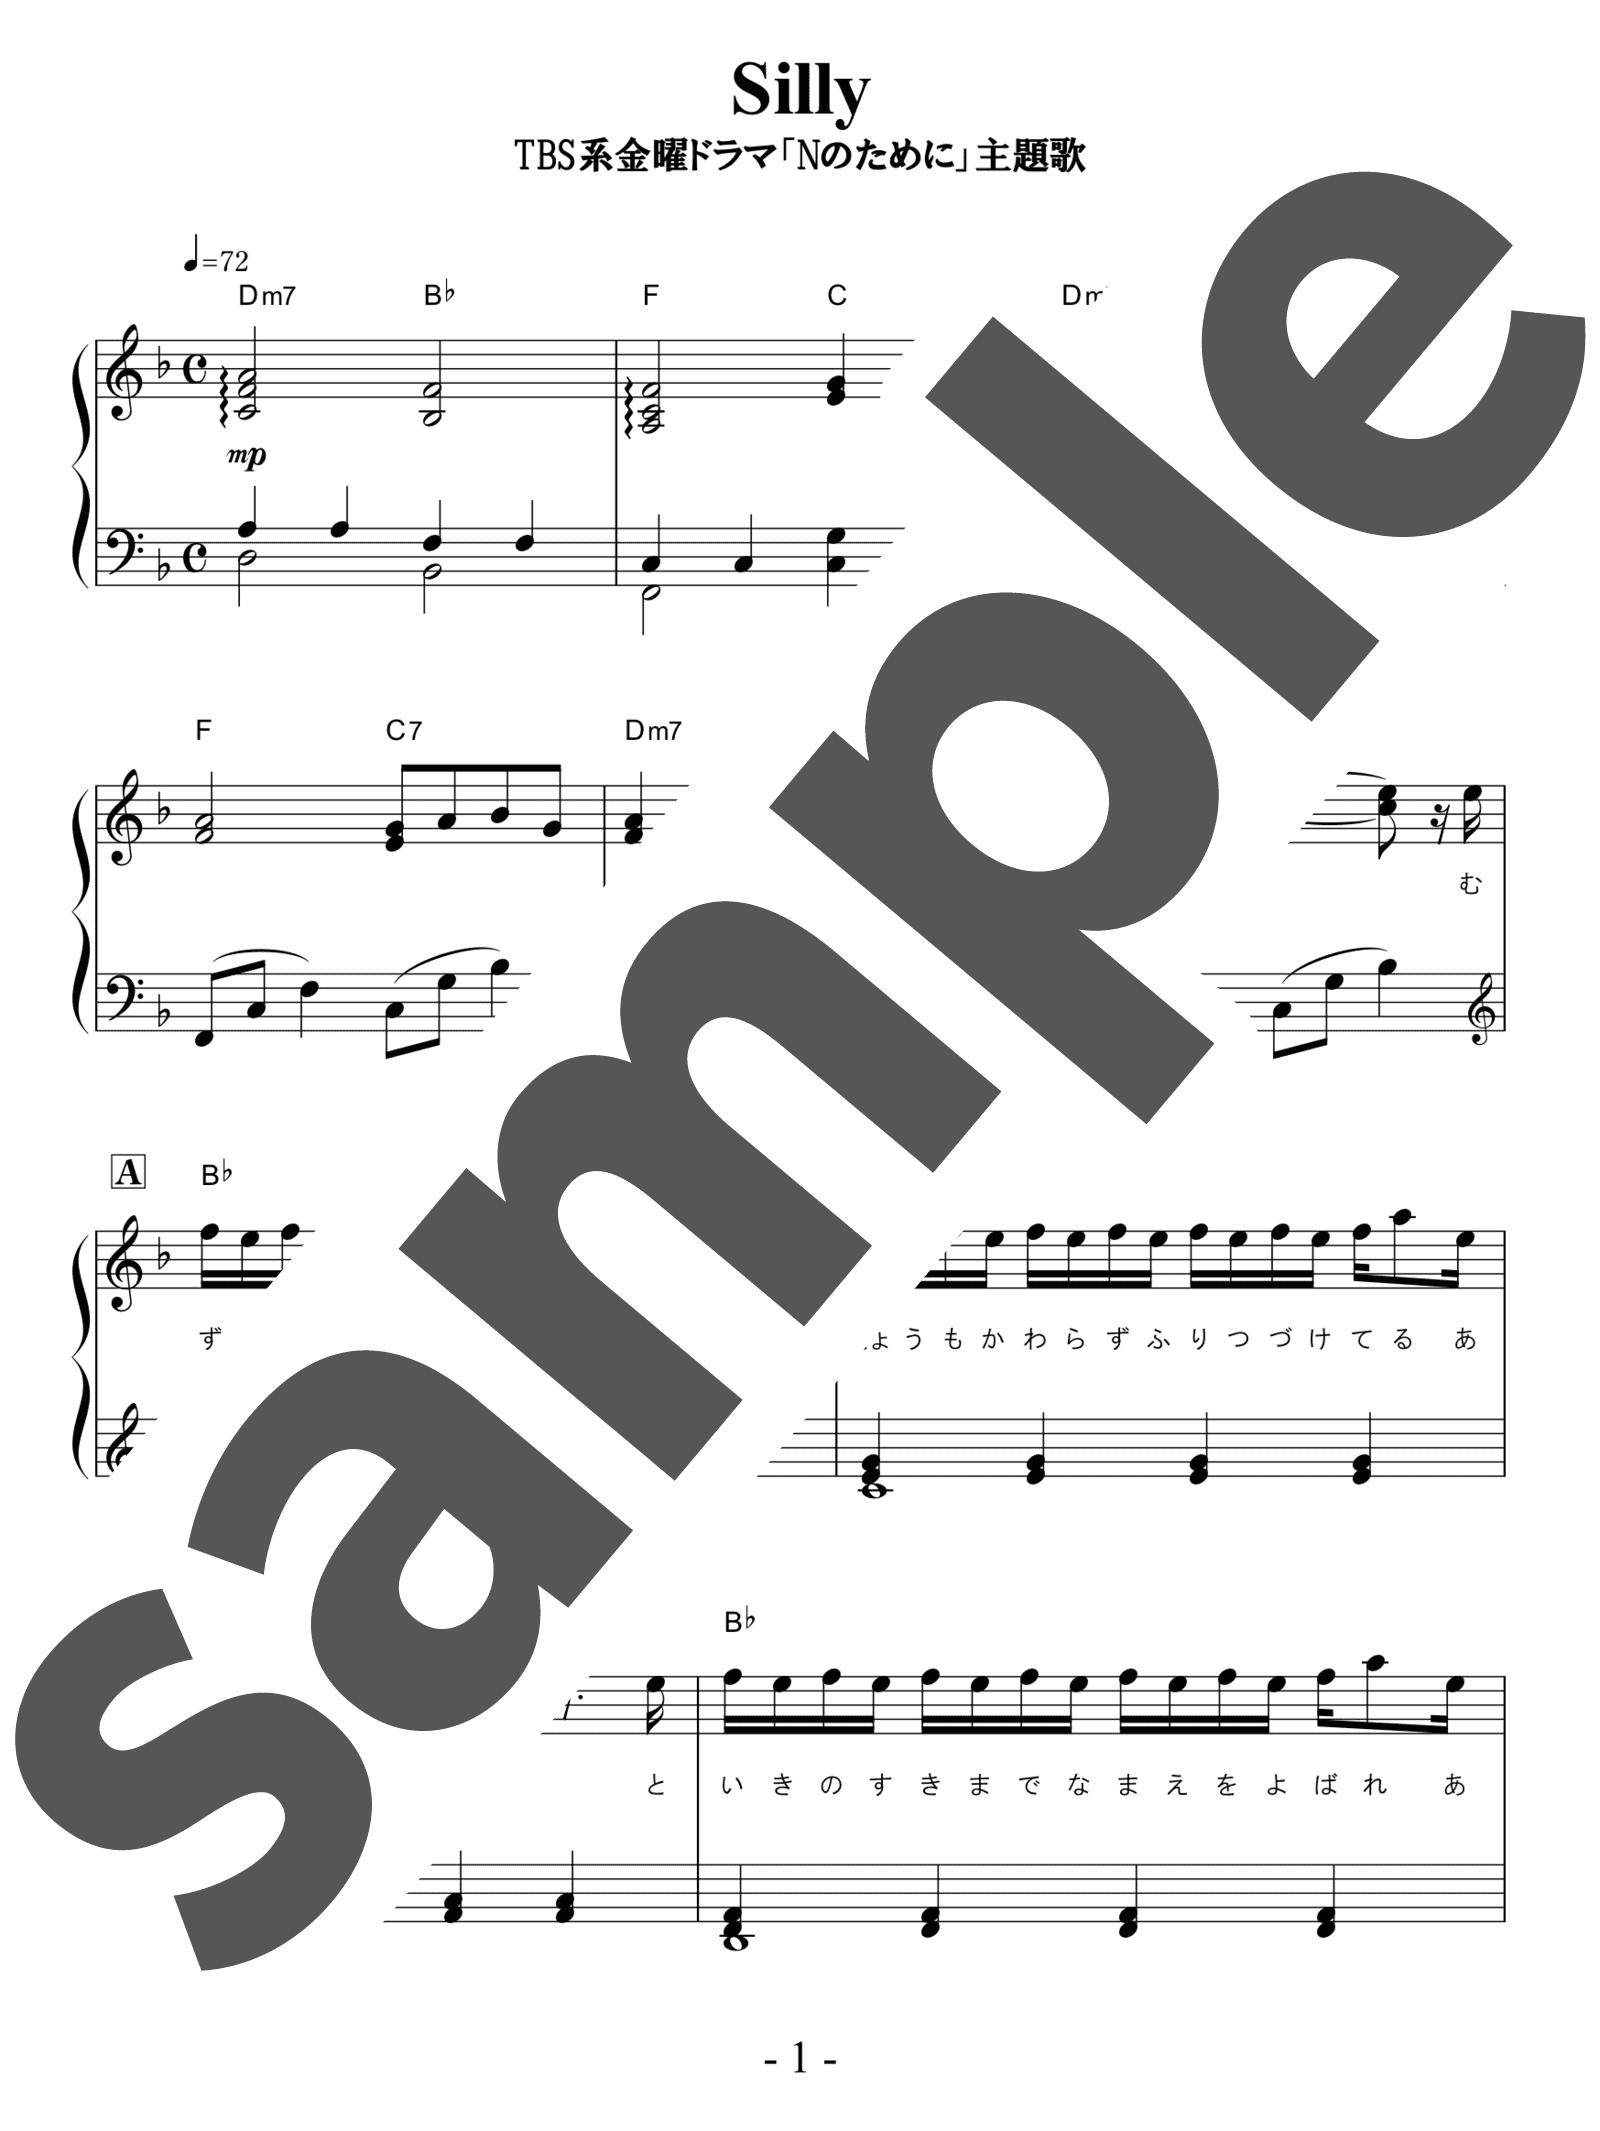 「Silly」のサンプル楽譜